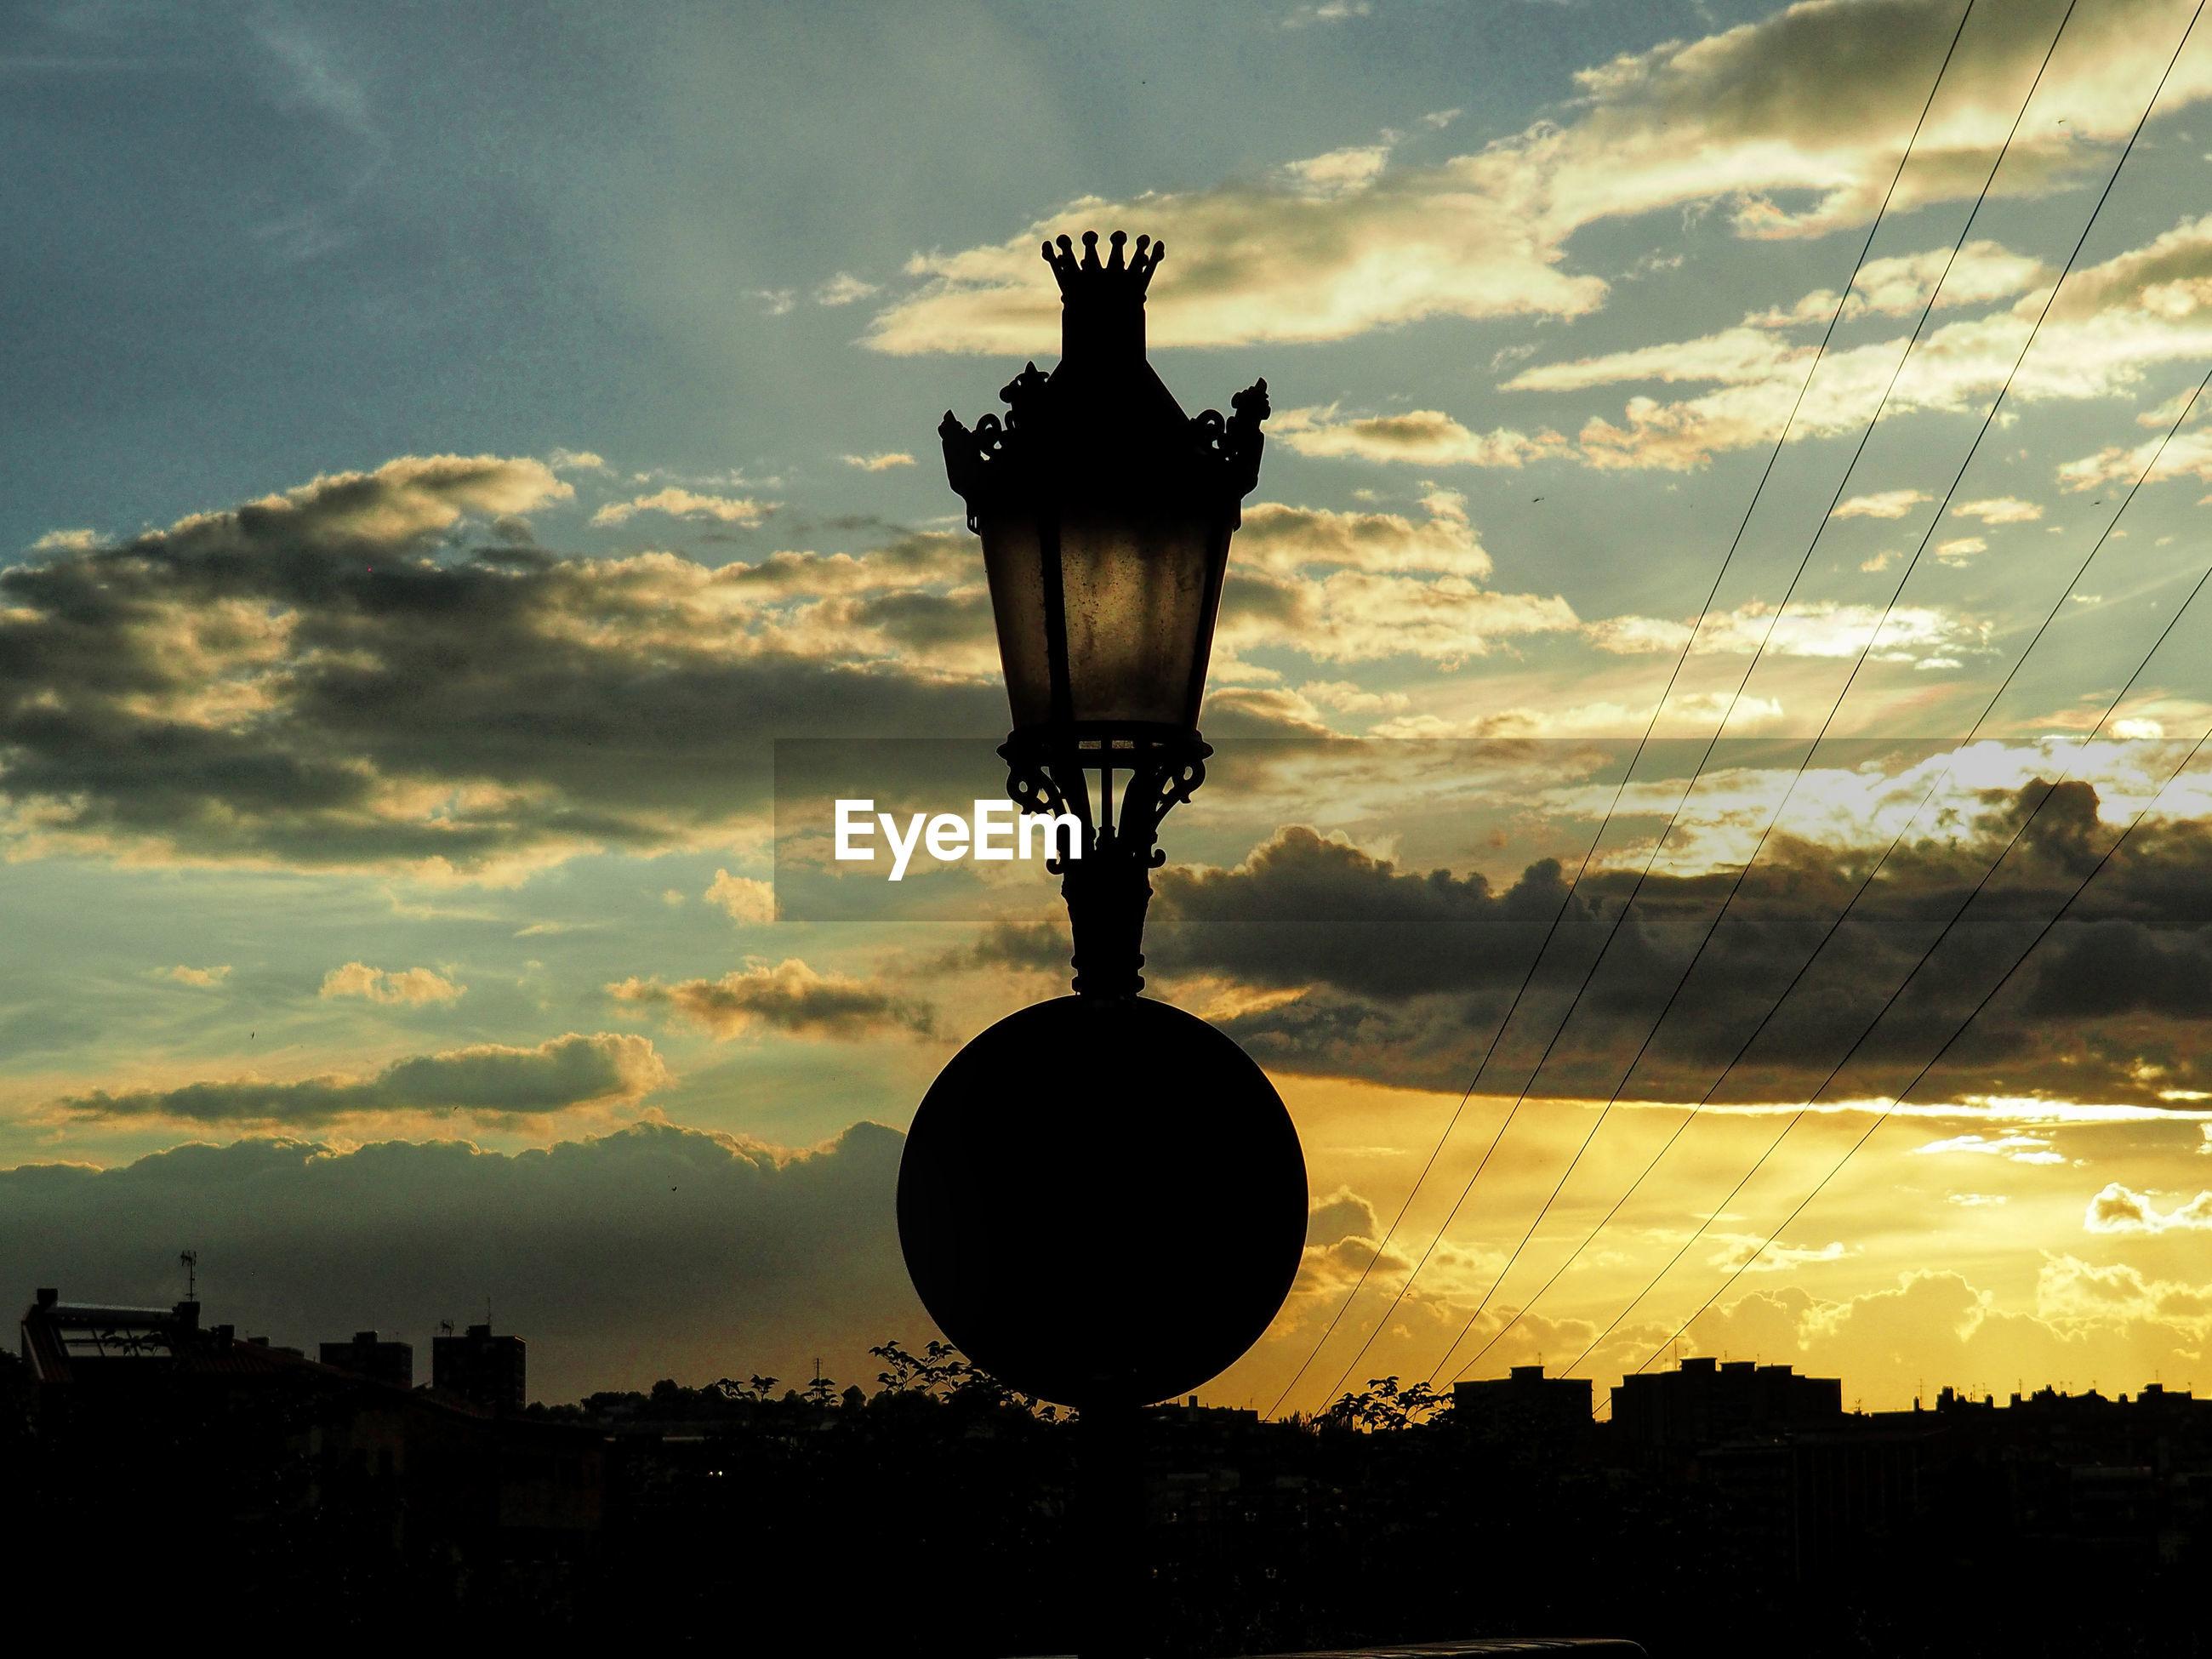 SILHOUETTE LAMP AGAINST SKY